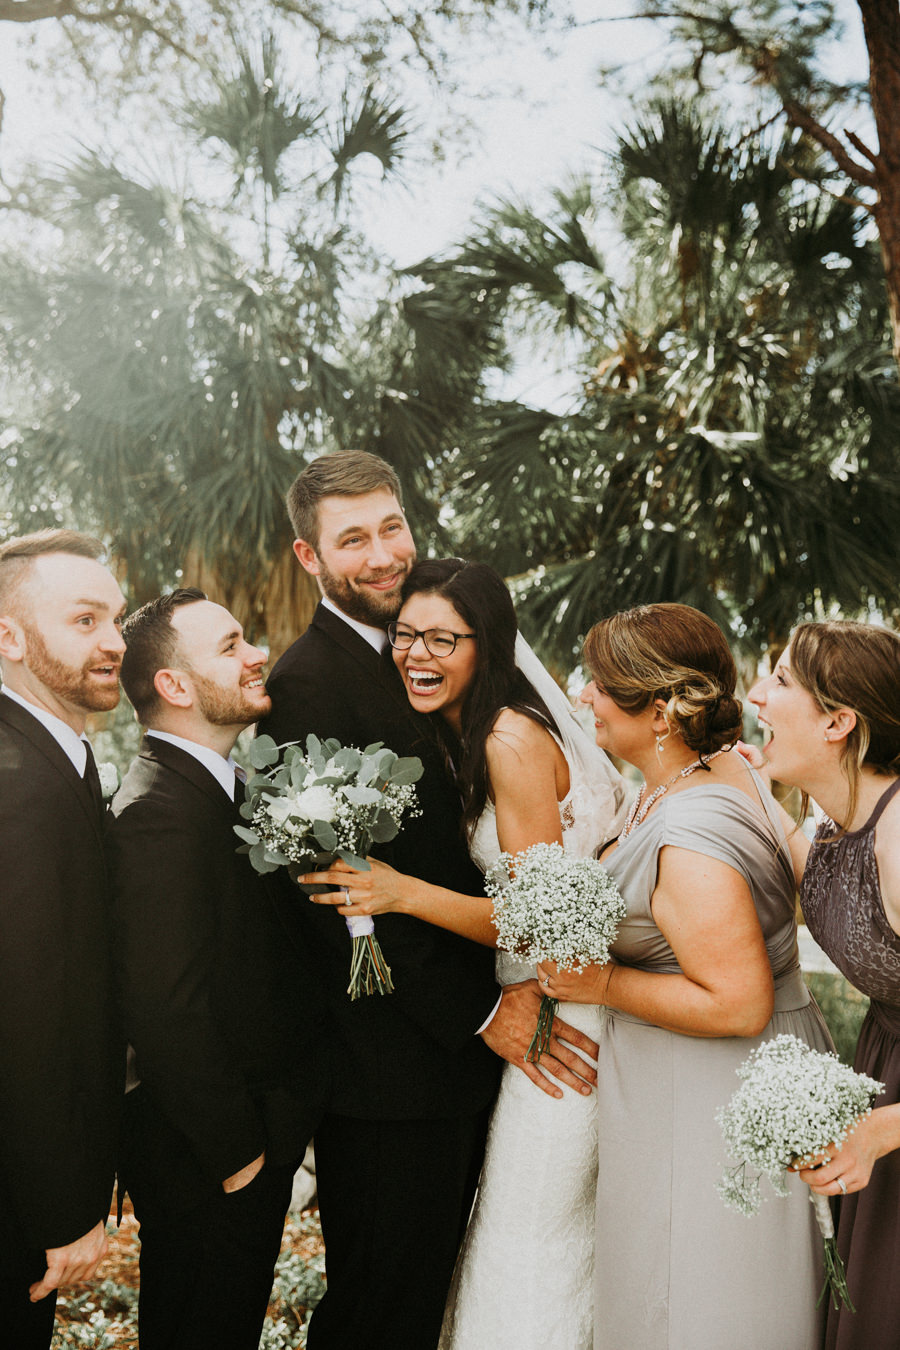 Tampa Heights Industrial Wedding at Cavu Emmy RJ-93.jpg